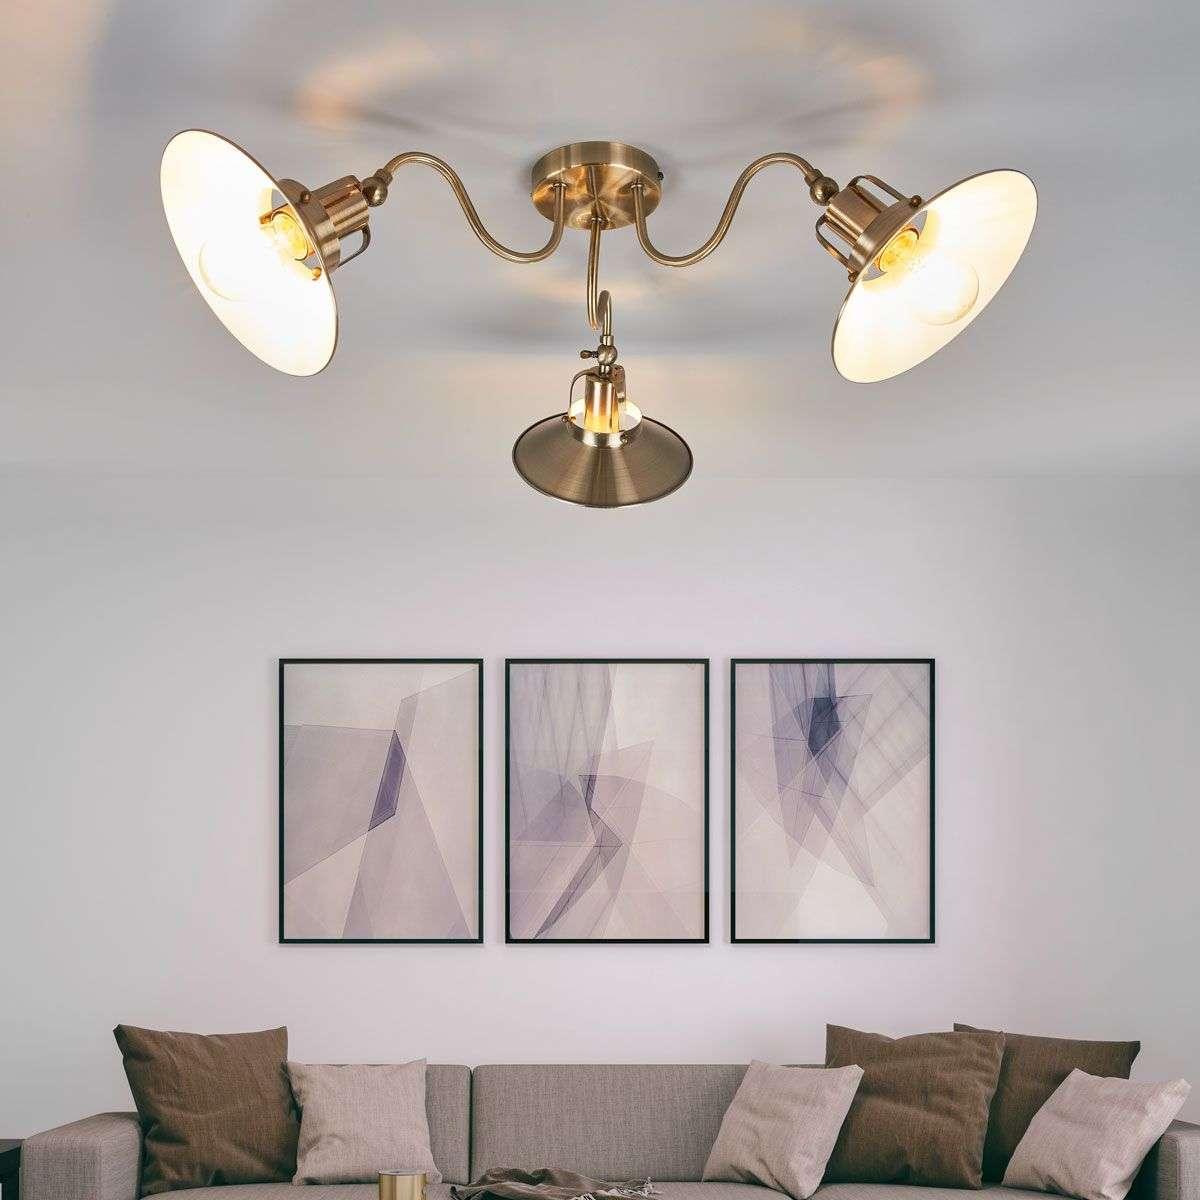 Three Bulb Ceiling Lamp Arkadia In Antique Brass 9639056 32